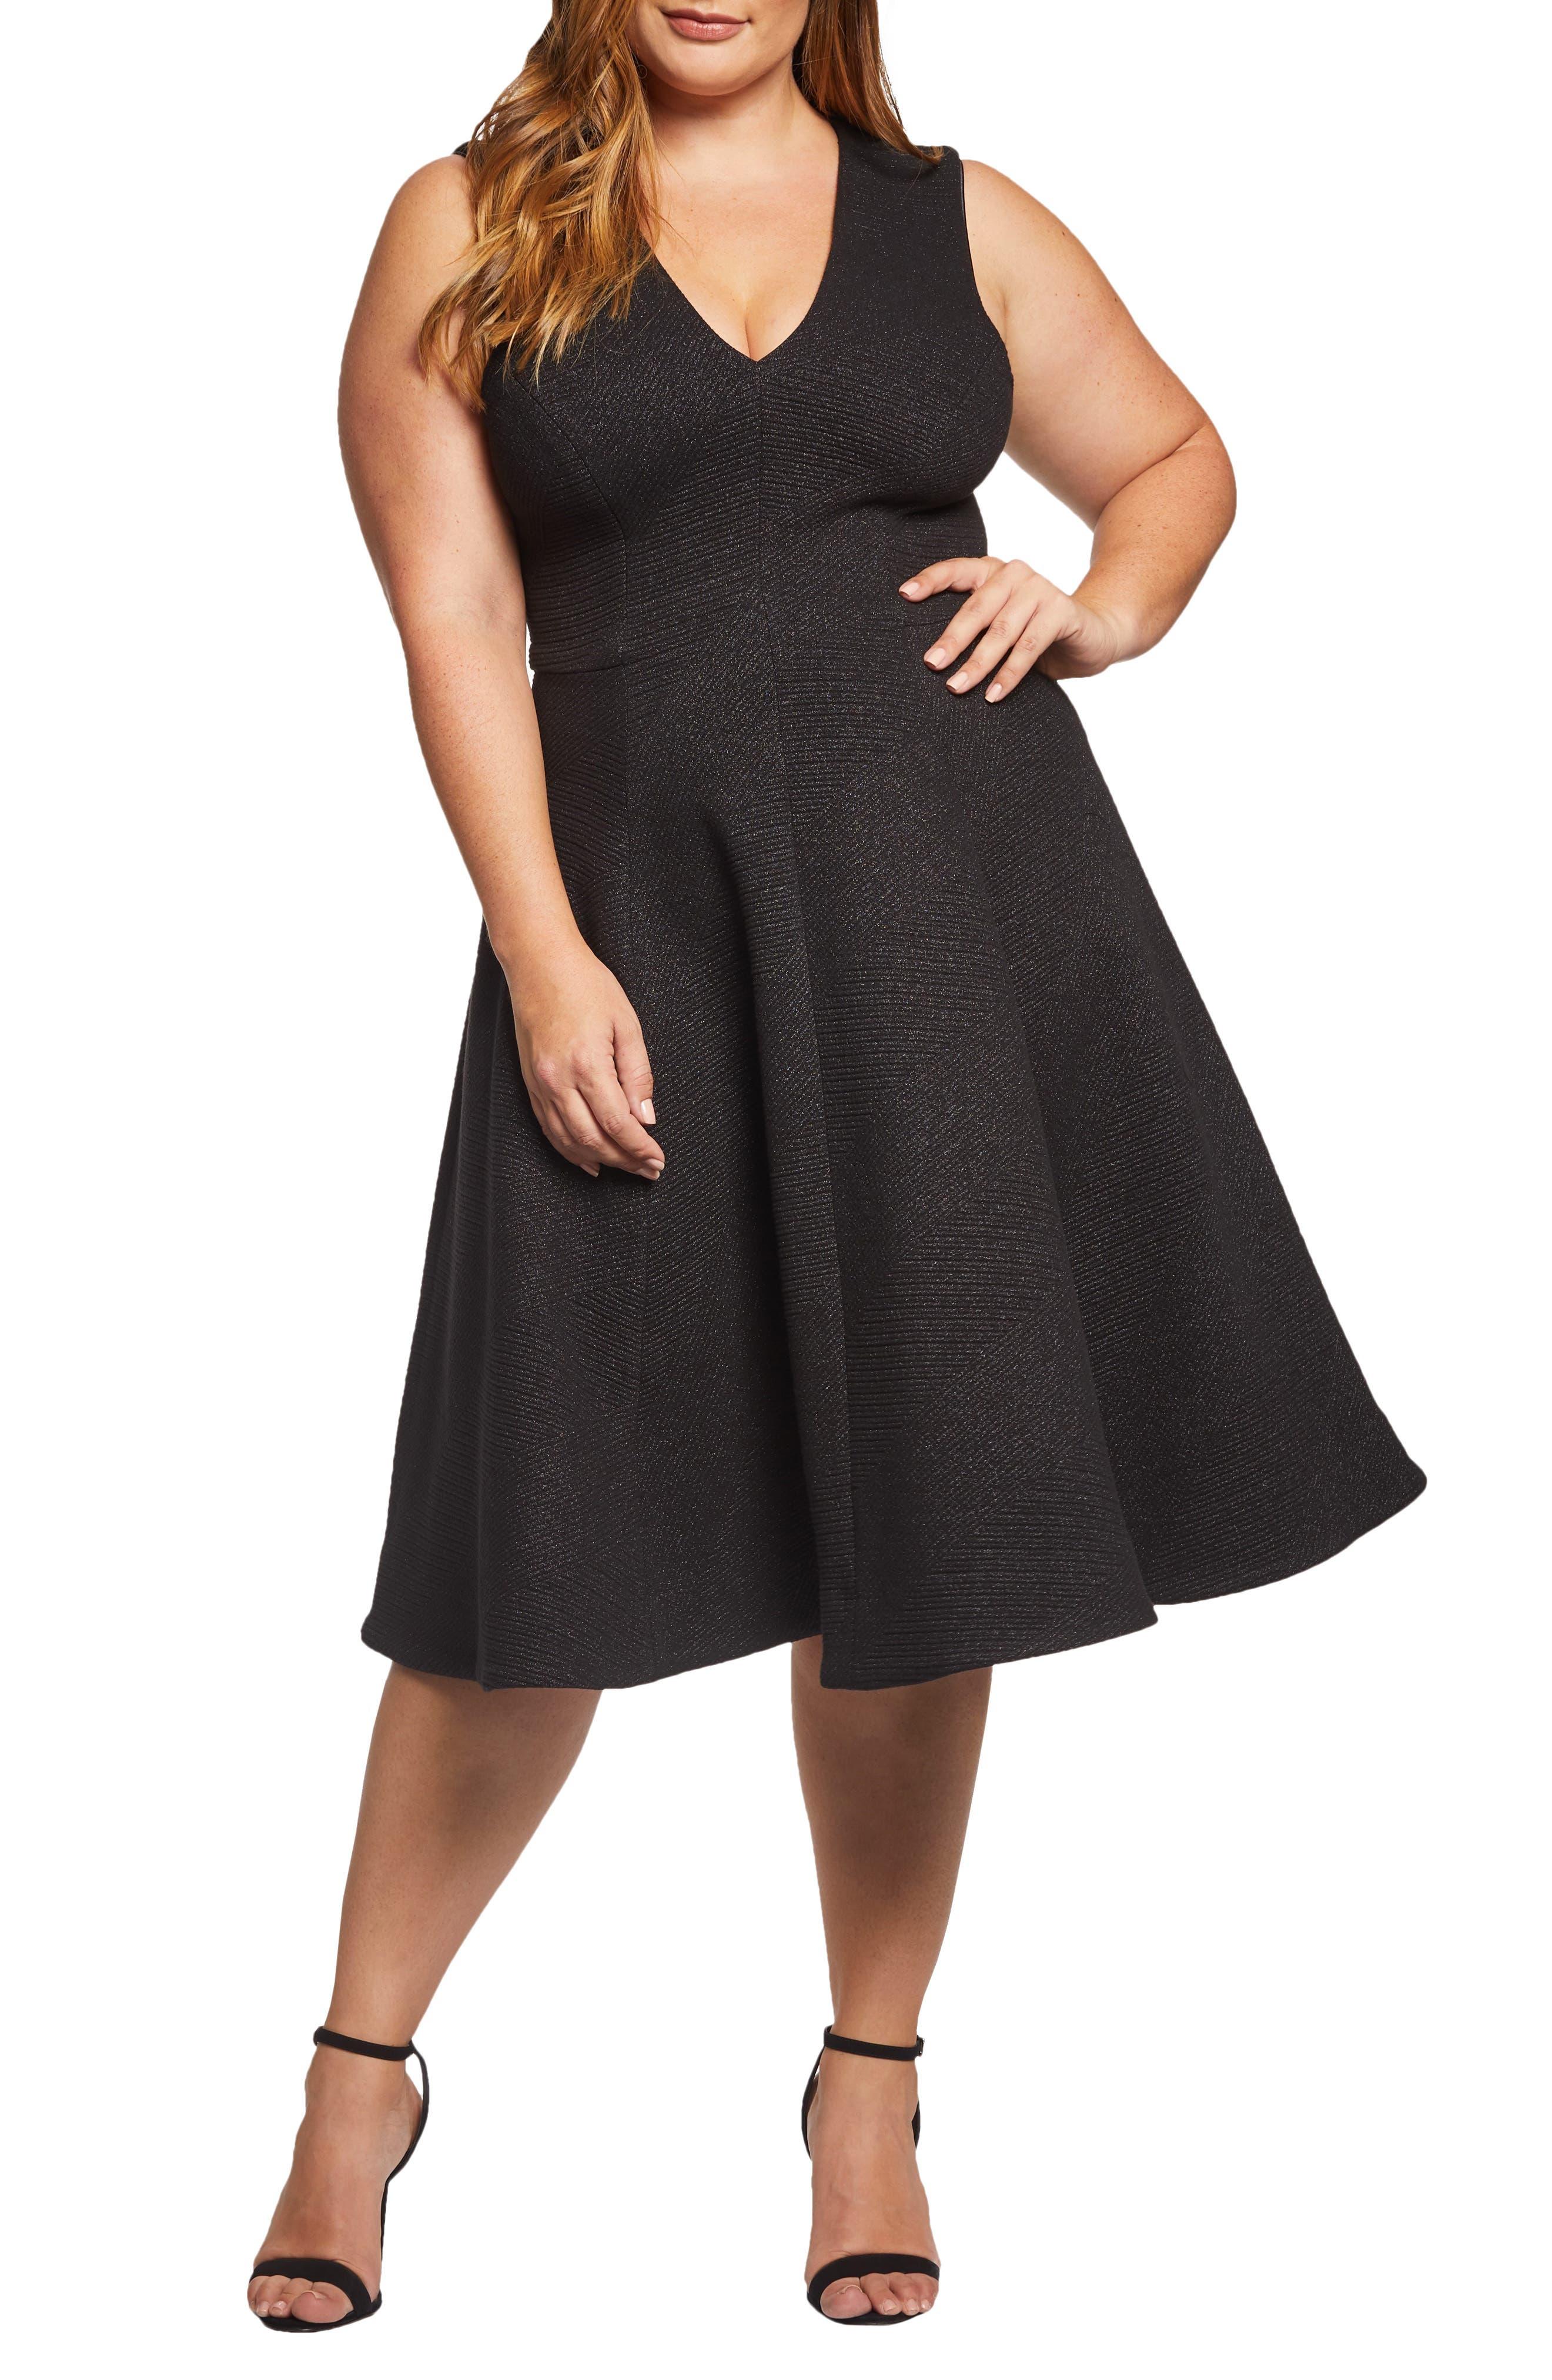 DRESS THE POPULATION, Sleeveless A-Line Dress, Main thumbnail 1, color, BLACK